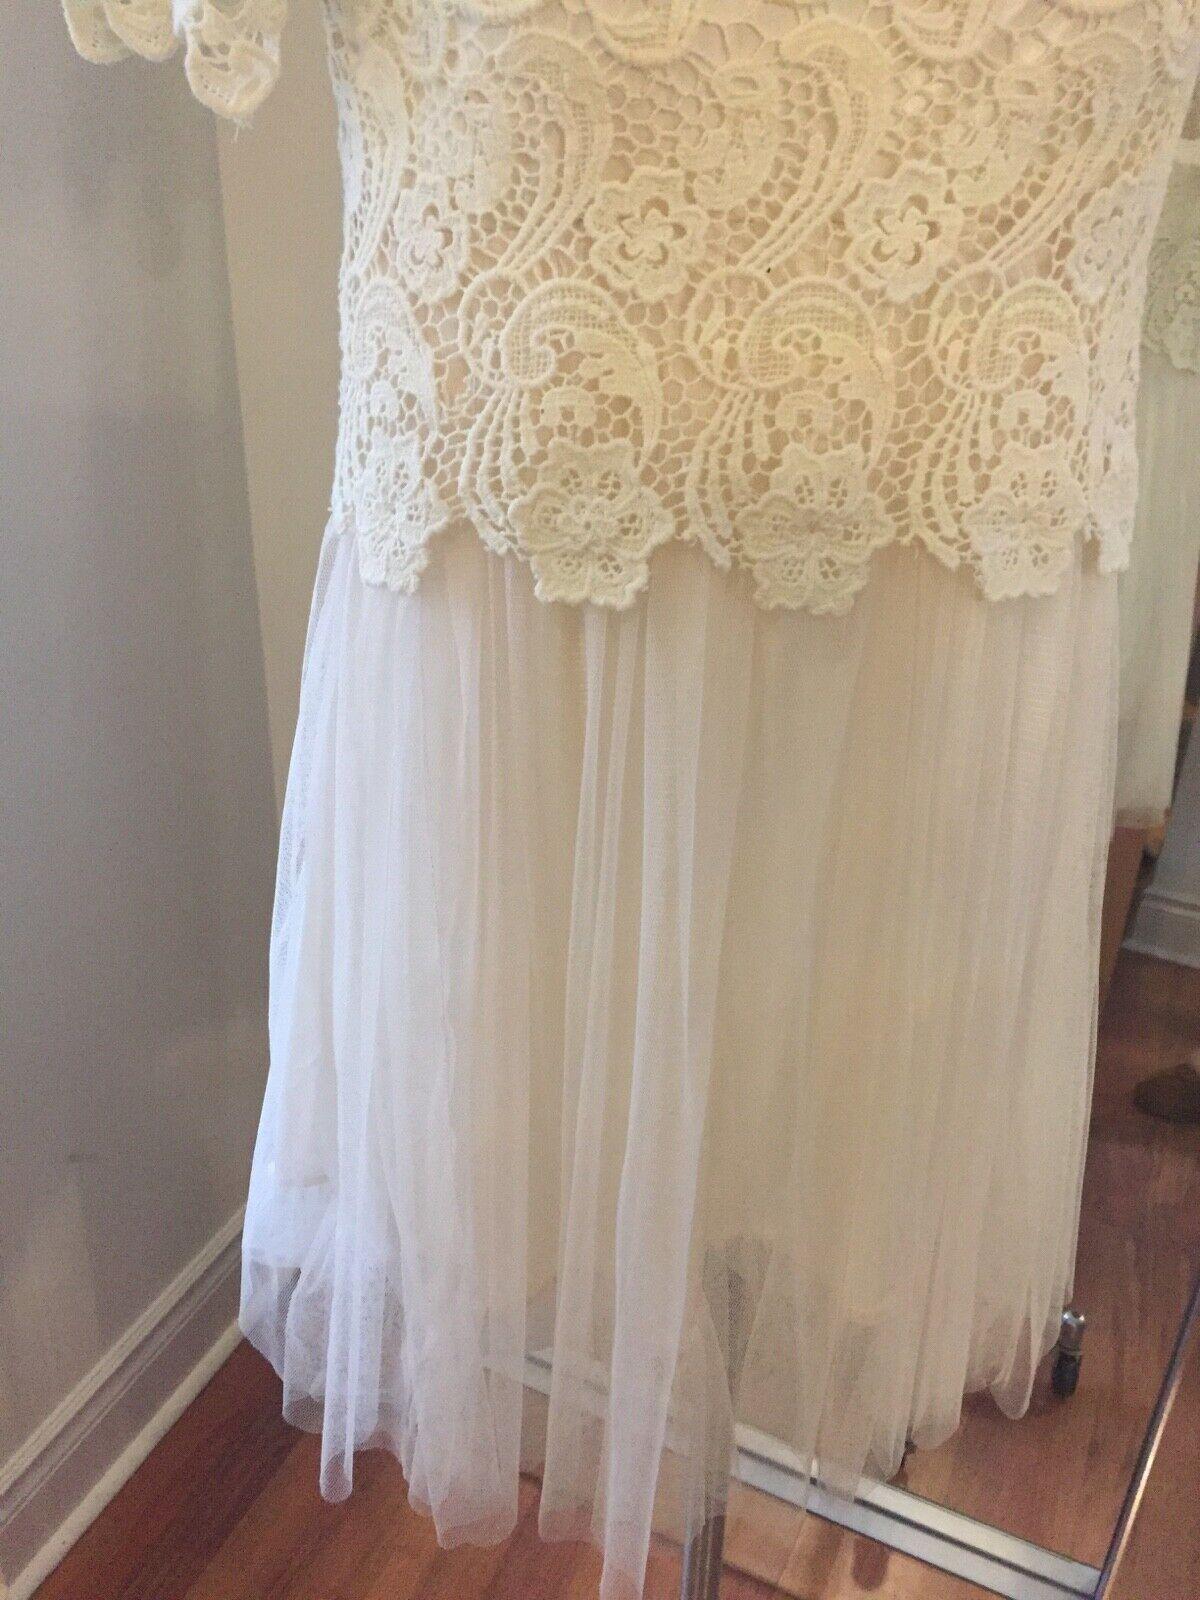 213 BY MICHELLE KIM KIM KIM Ivory Beige Crochet Tulle Mini Dress Size S Retail  350 7ed054